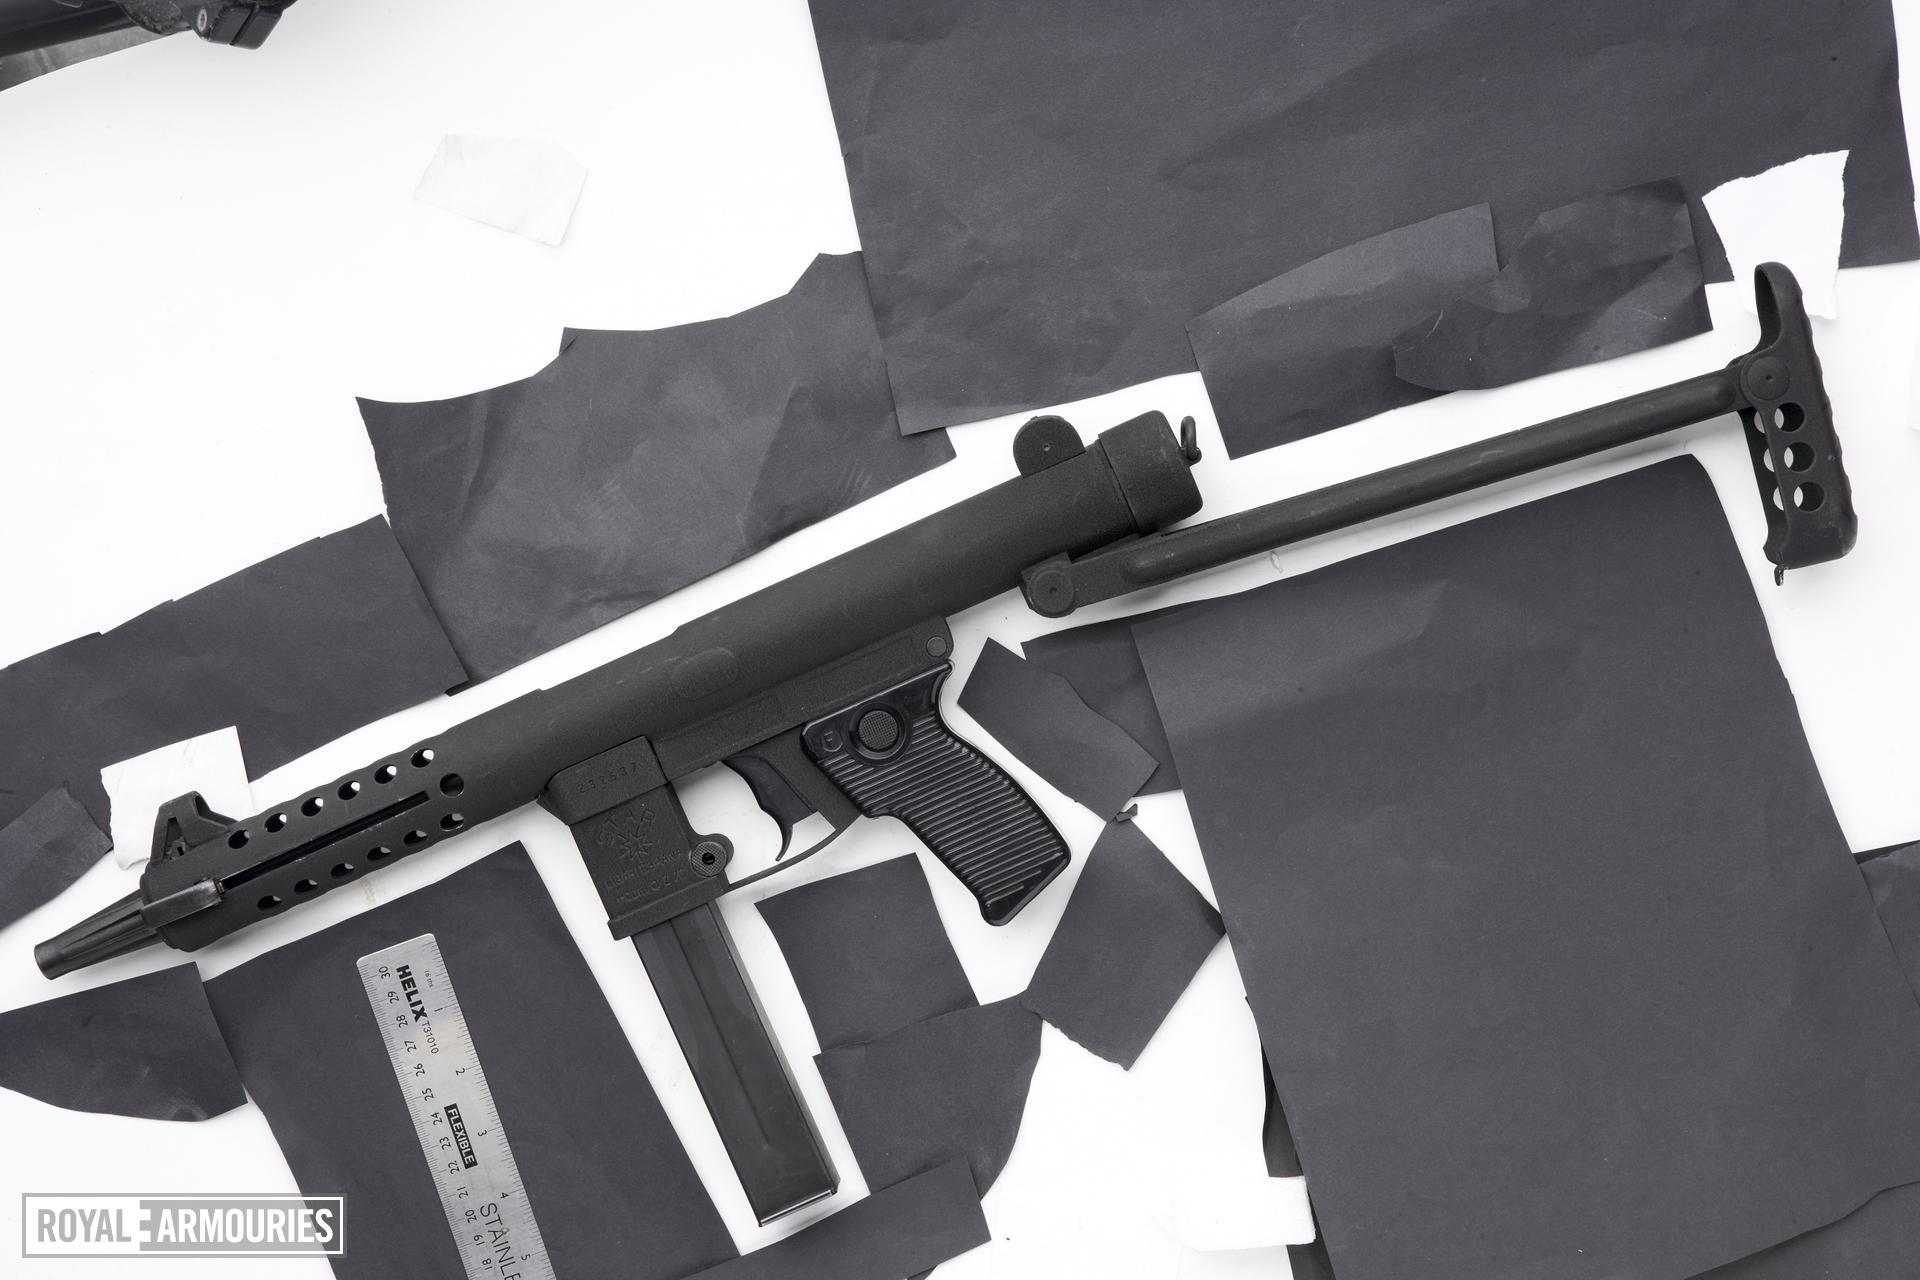 Centrefire automatic submachine gun - Star Model Z-70